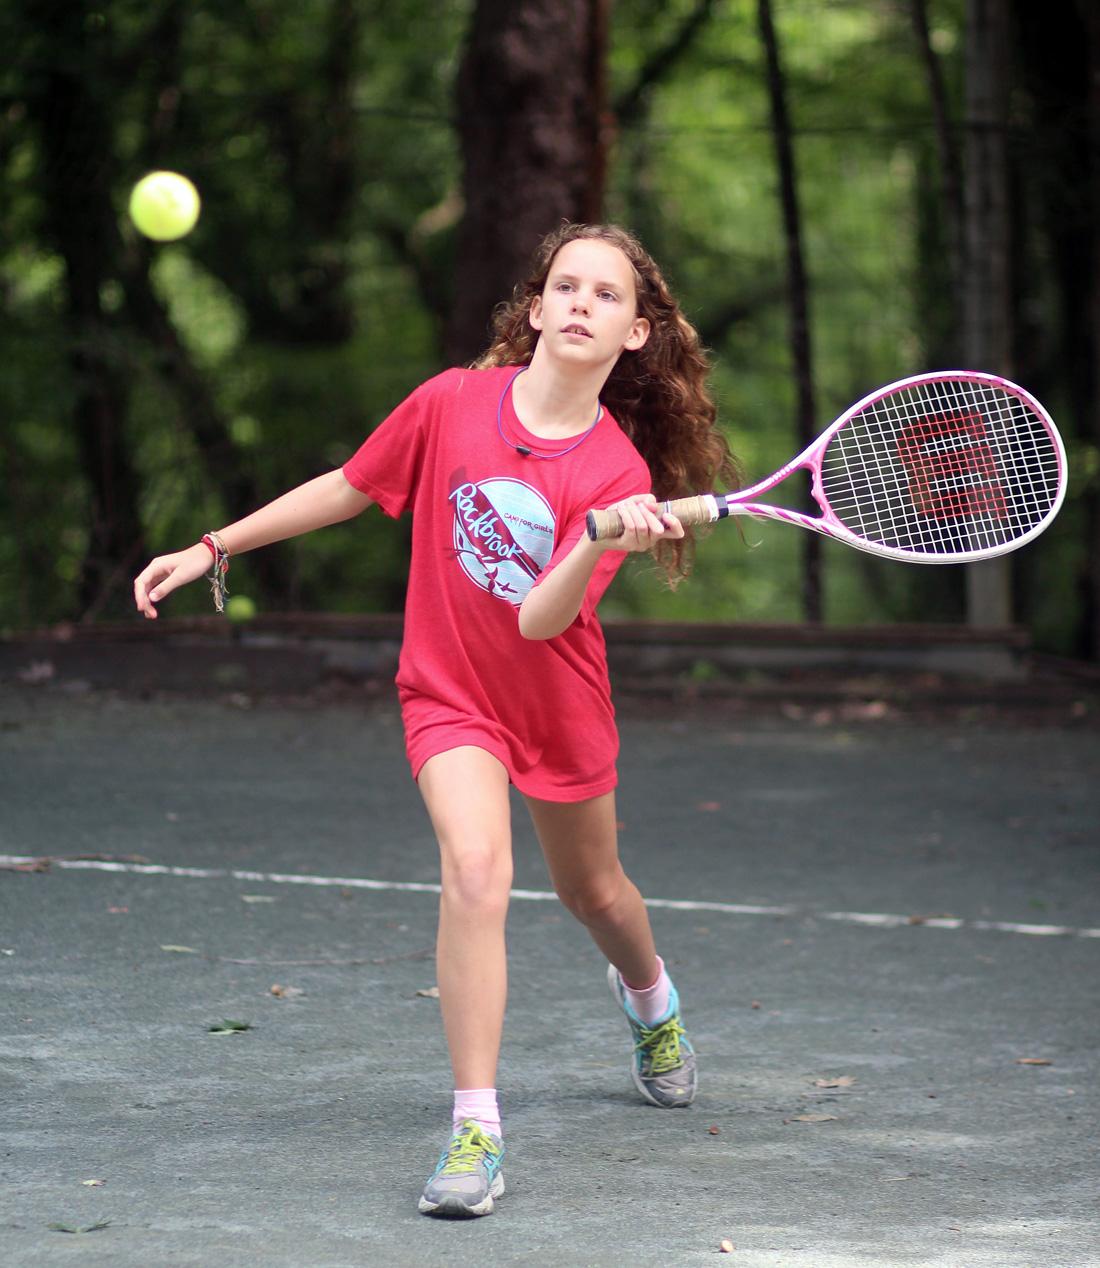 tennis camp girl